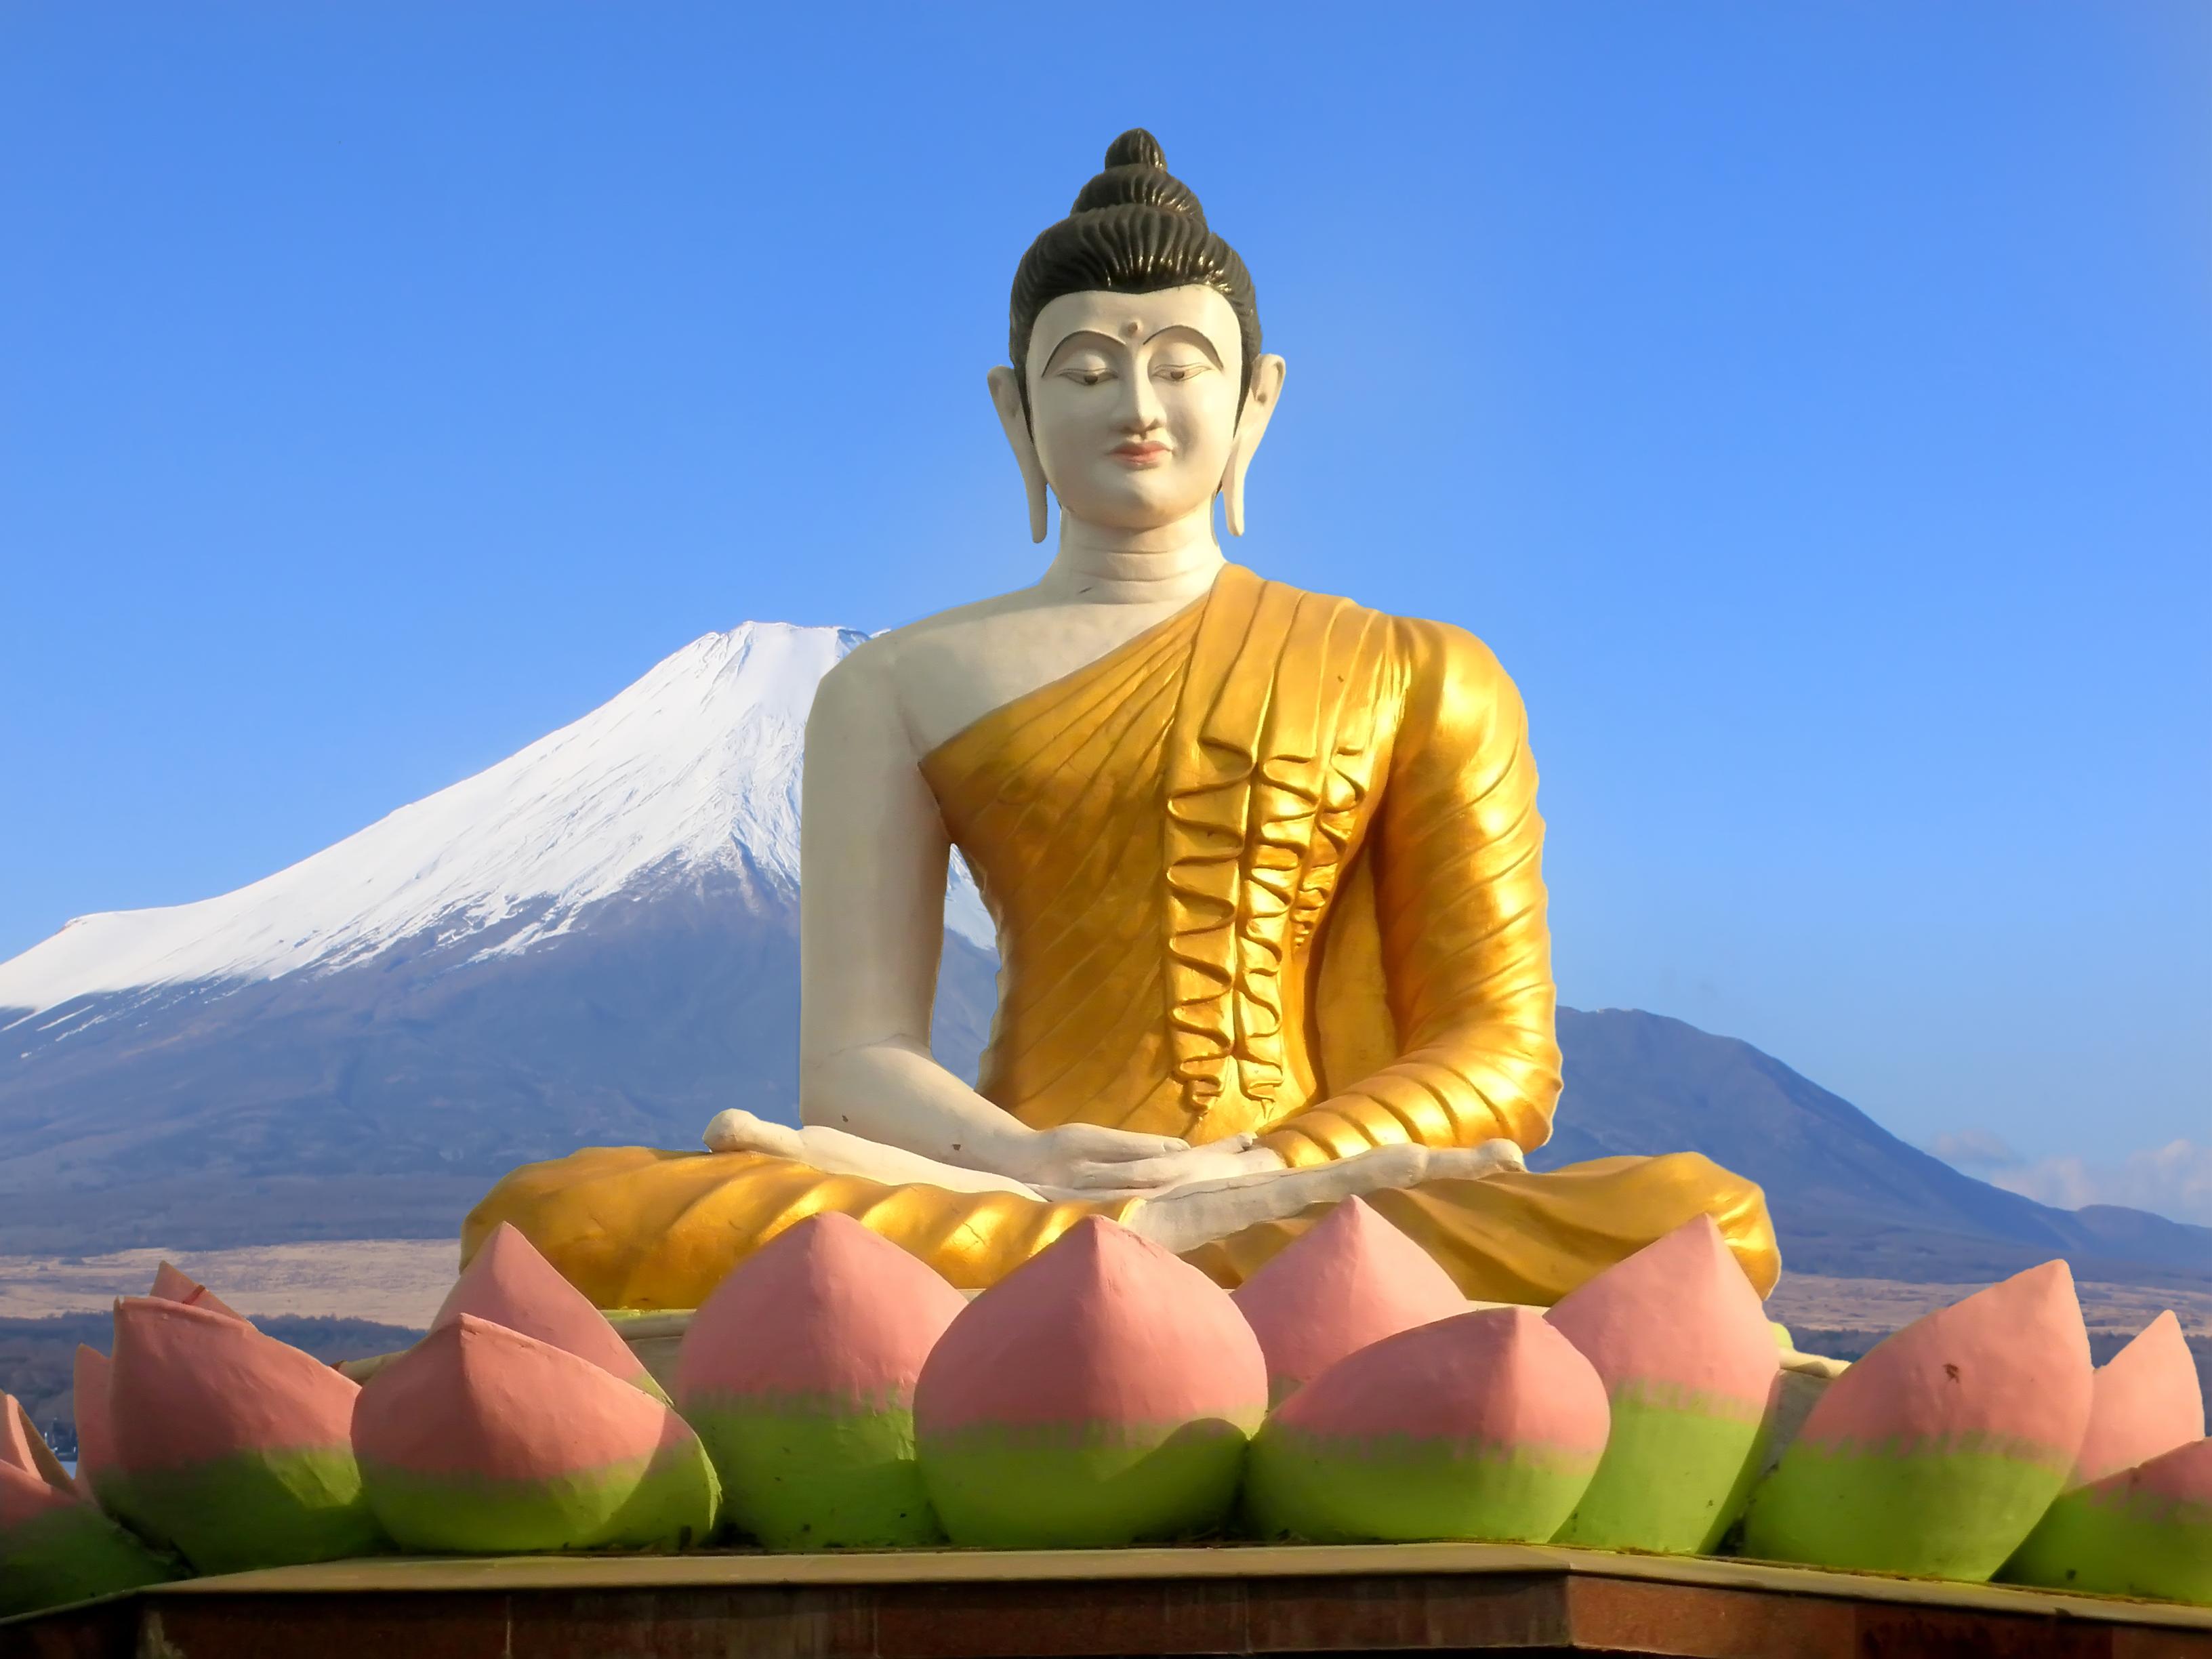 Amato A DI DA PHAT BUDDHA THAILAND Golden Buddha 13 by Tulinhbuddha on  GB07